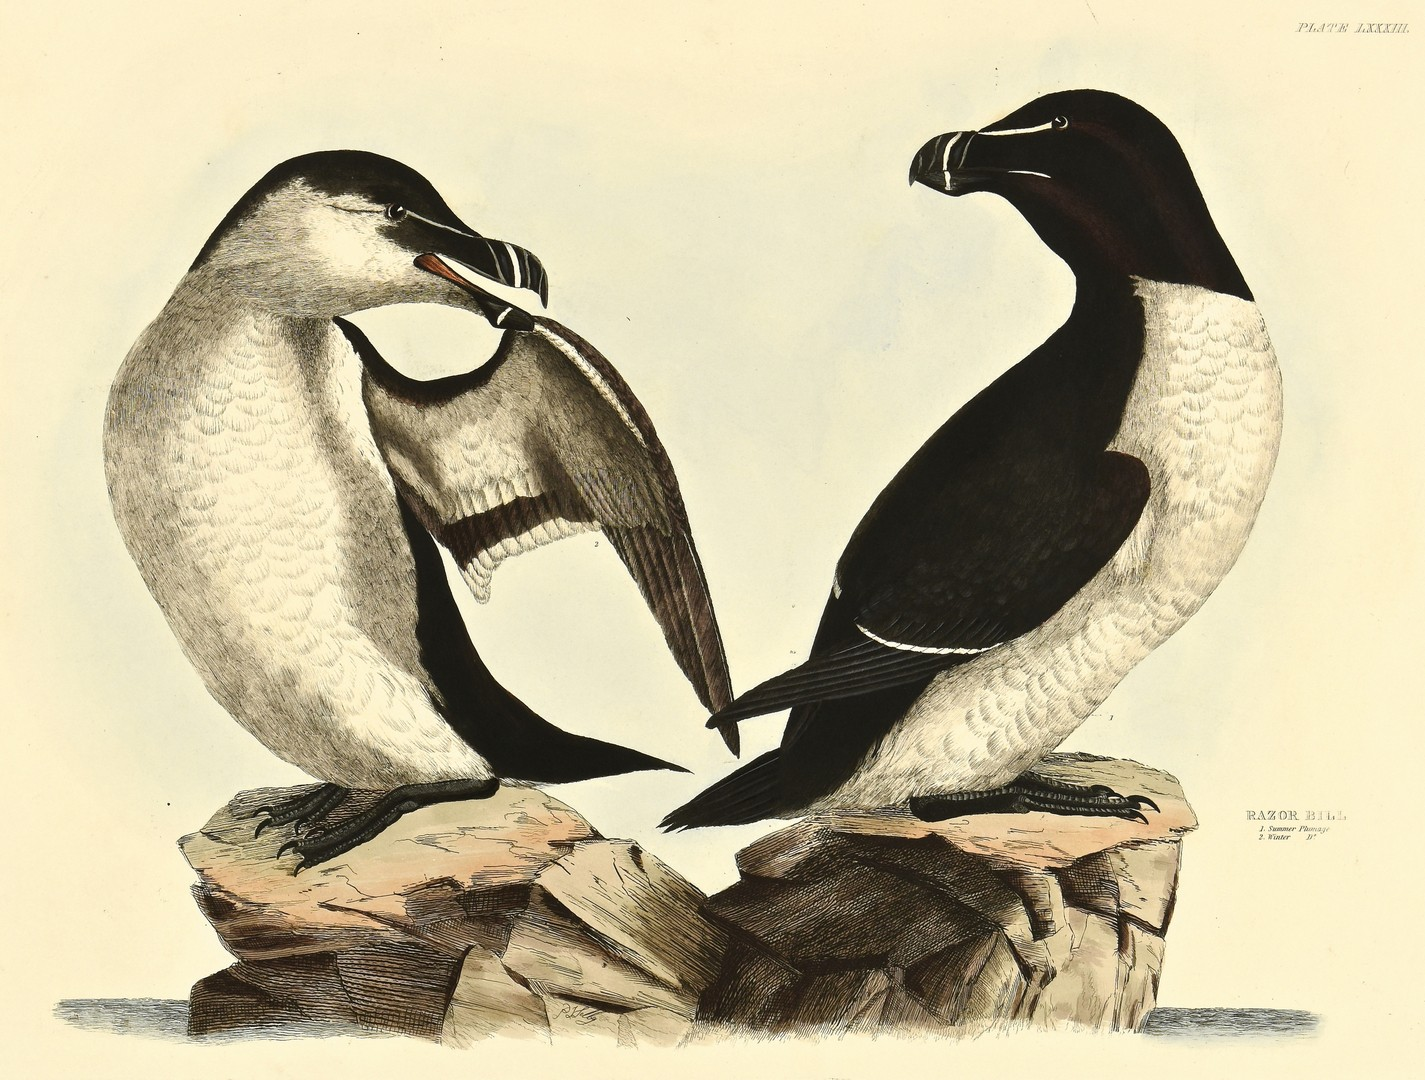 Lot 234: 4 Selby Bird Prints